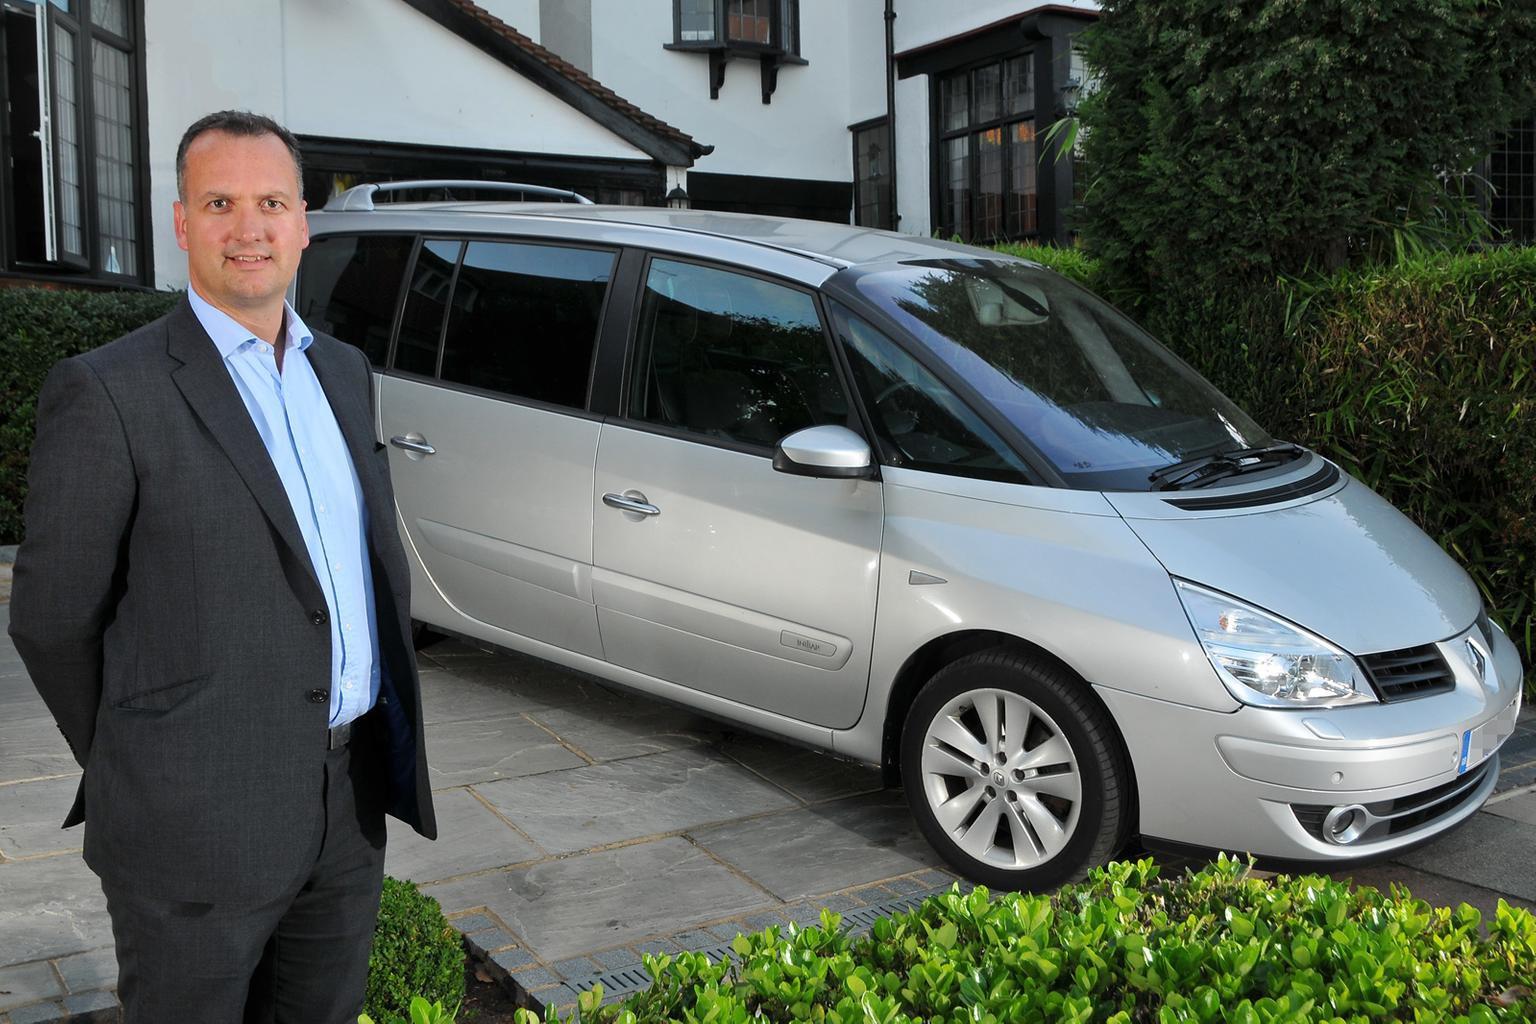 Renault Espace air-conditioning problem